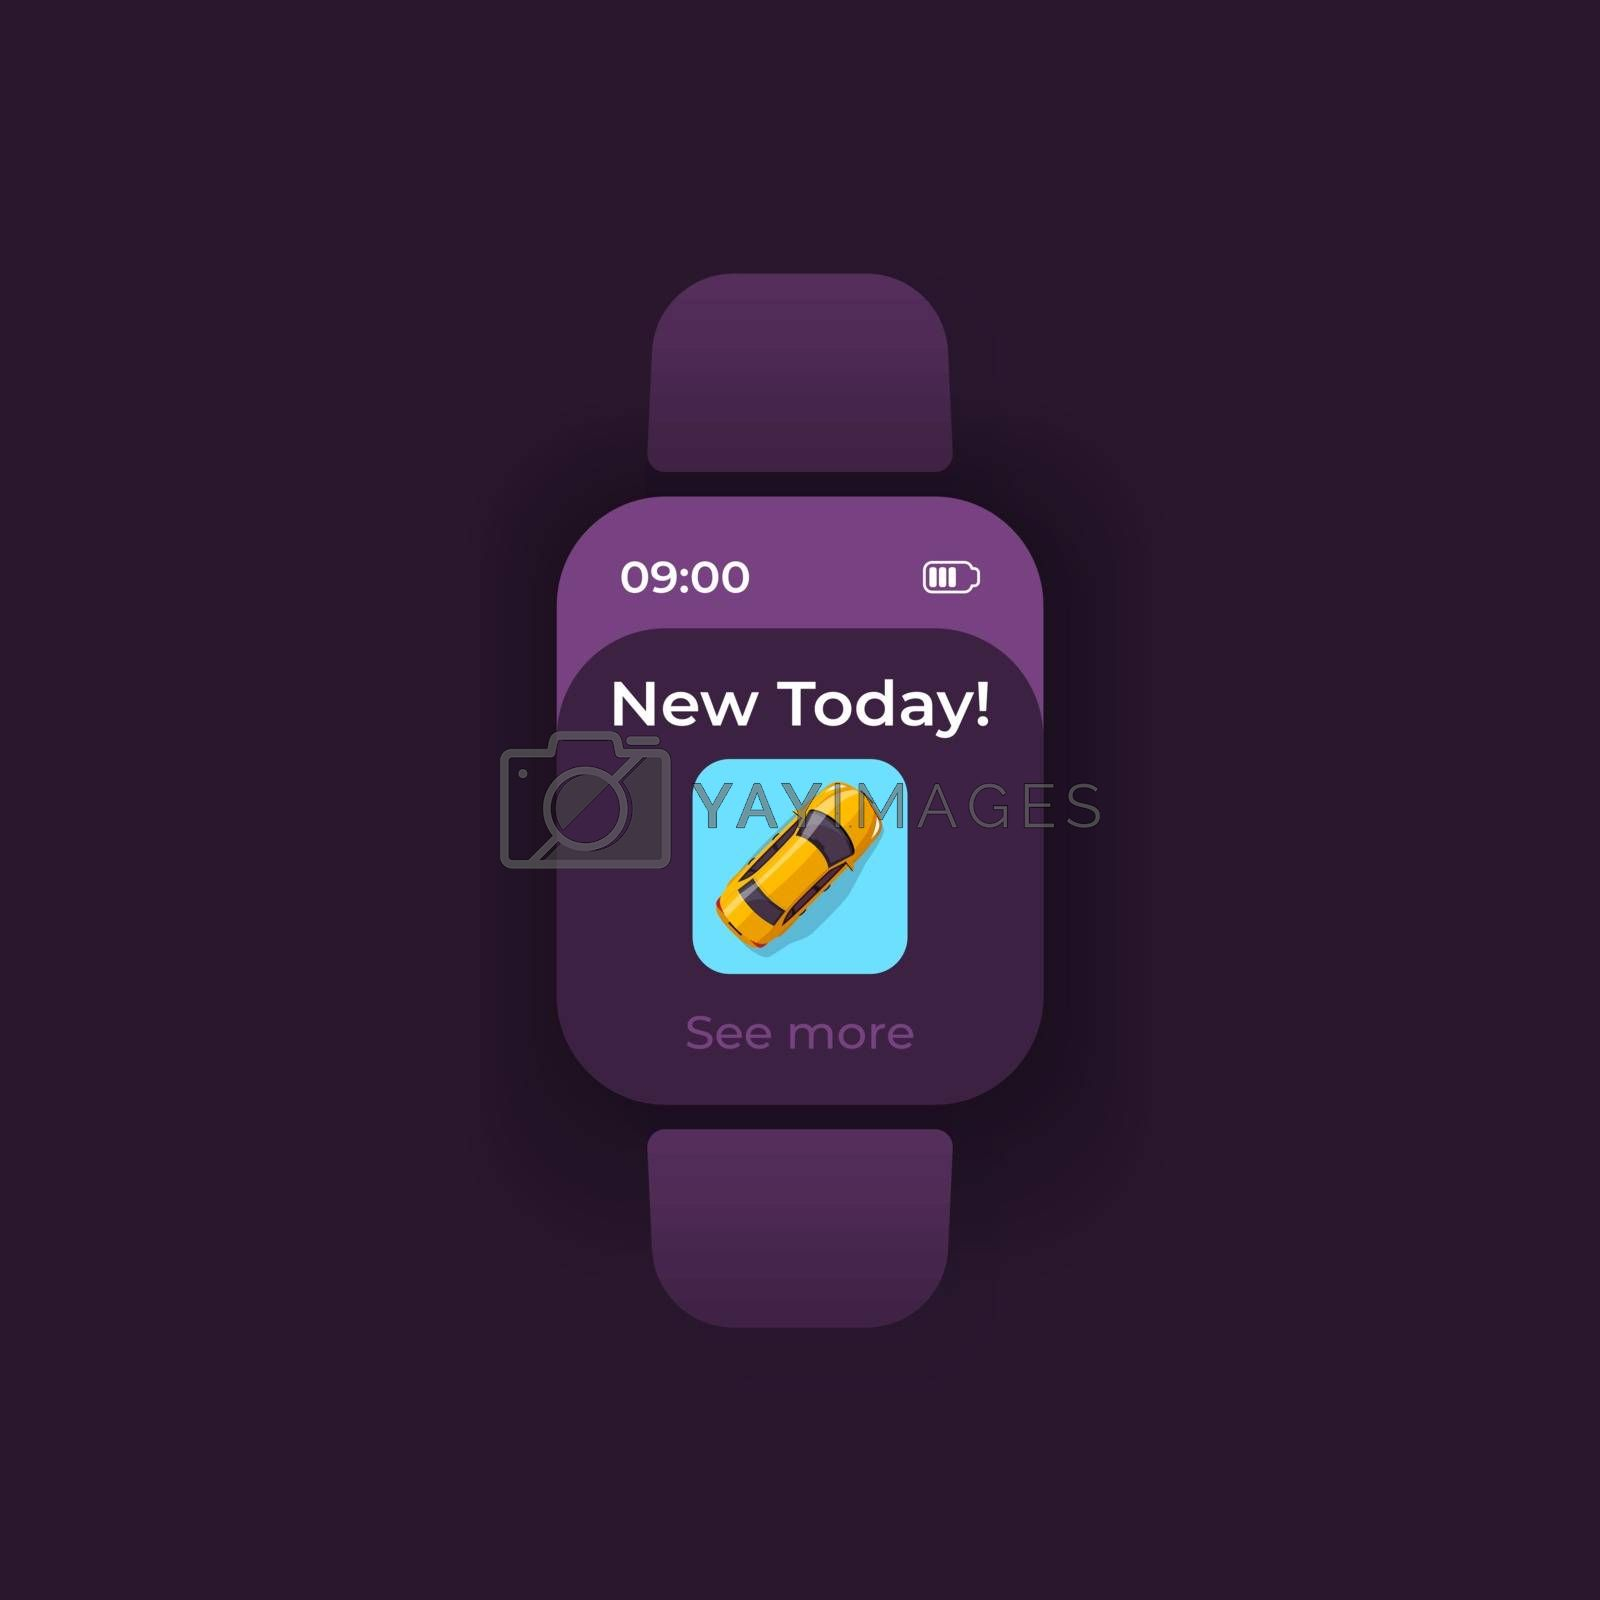 Transport update smartwatch interface vector template by bsd